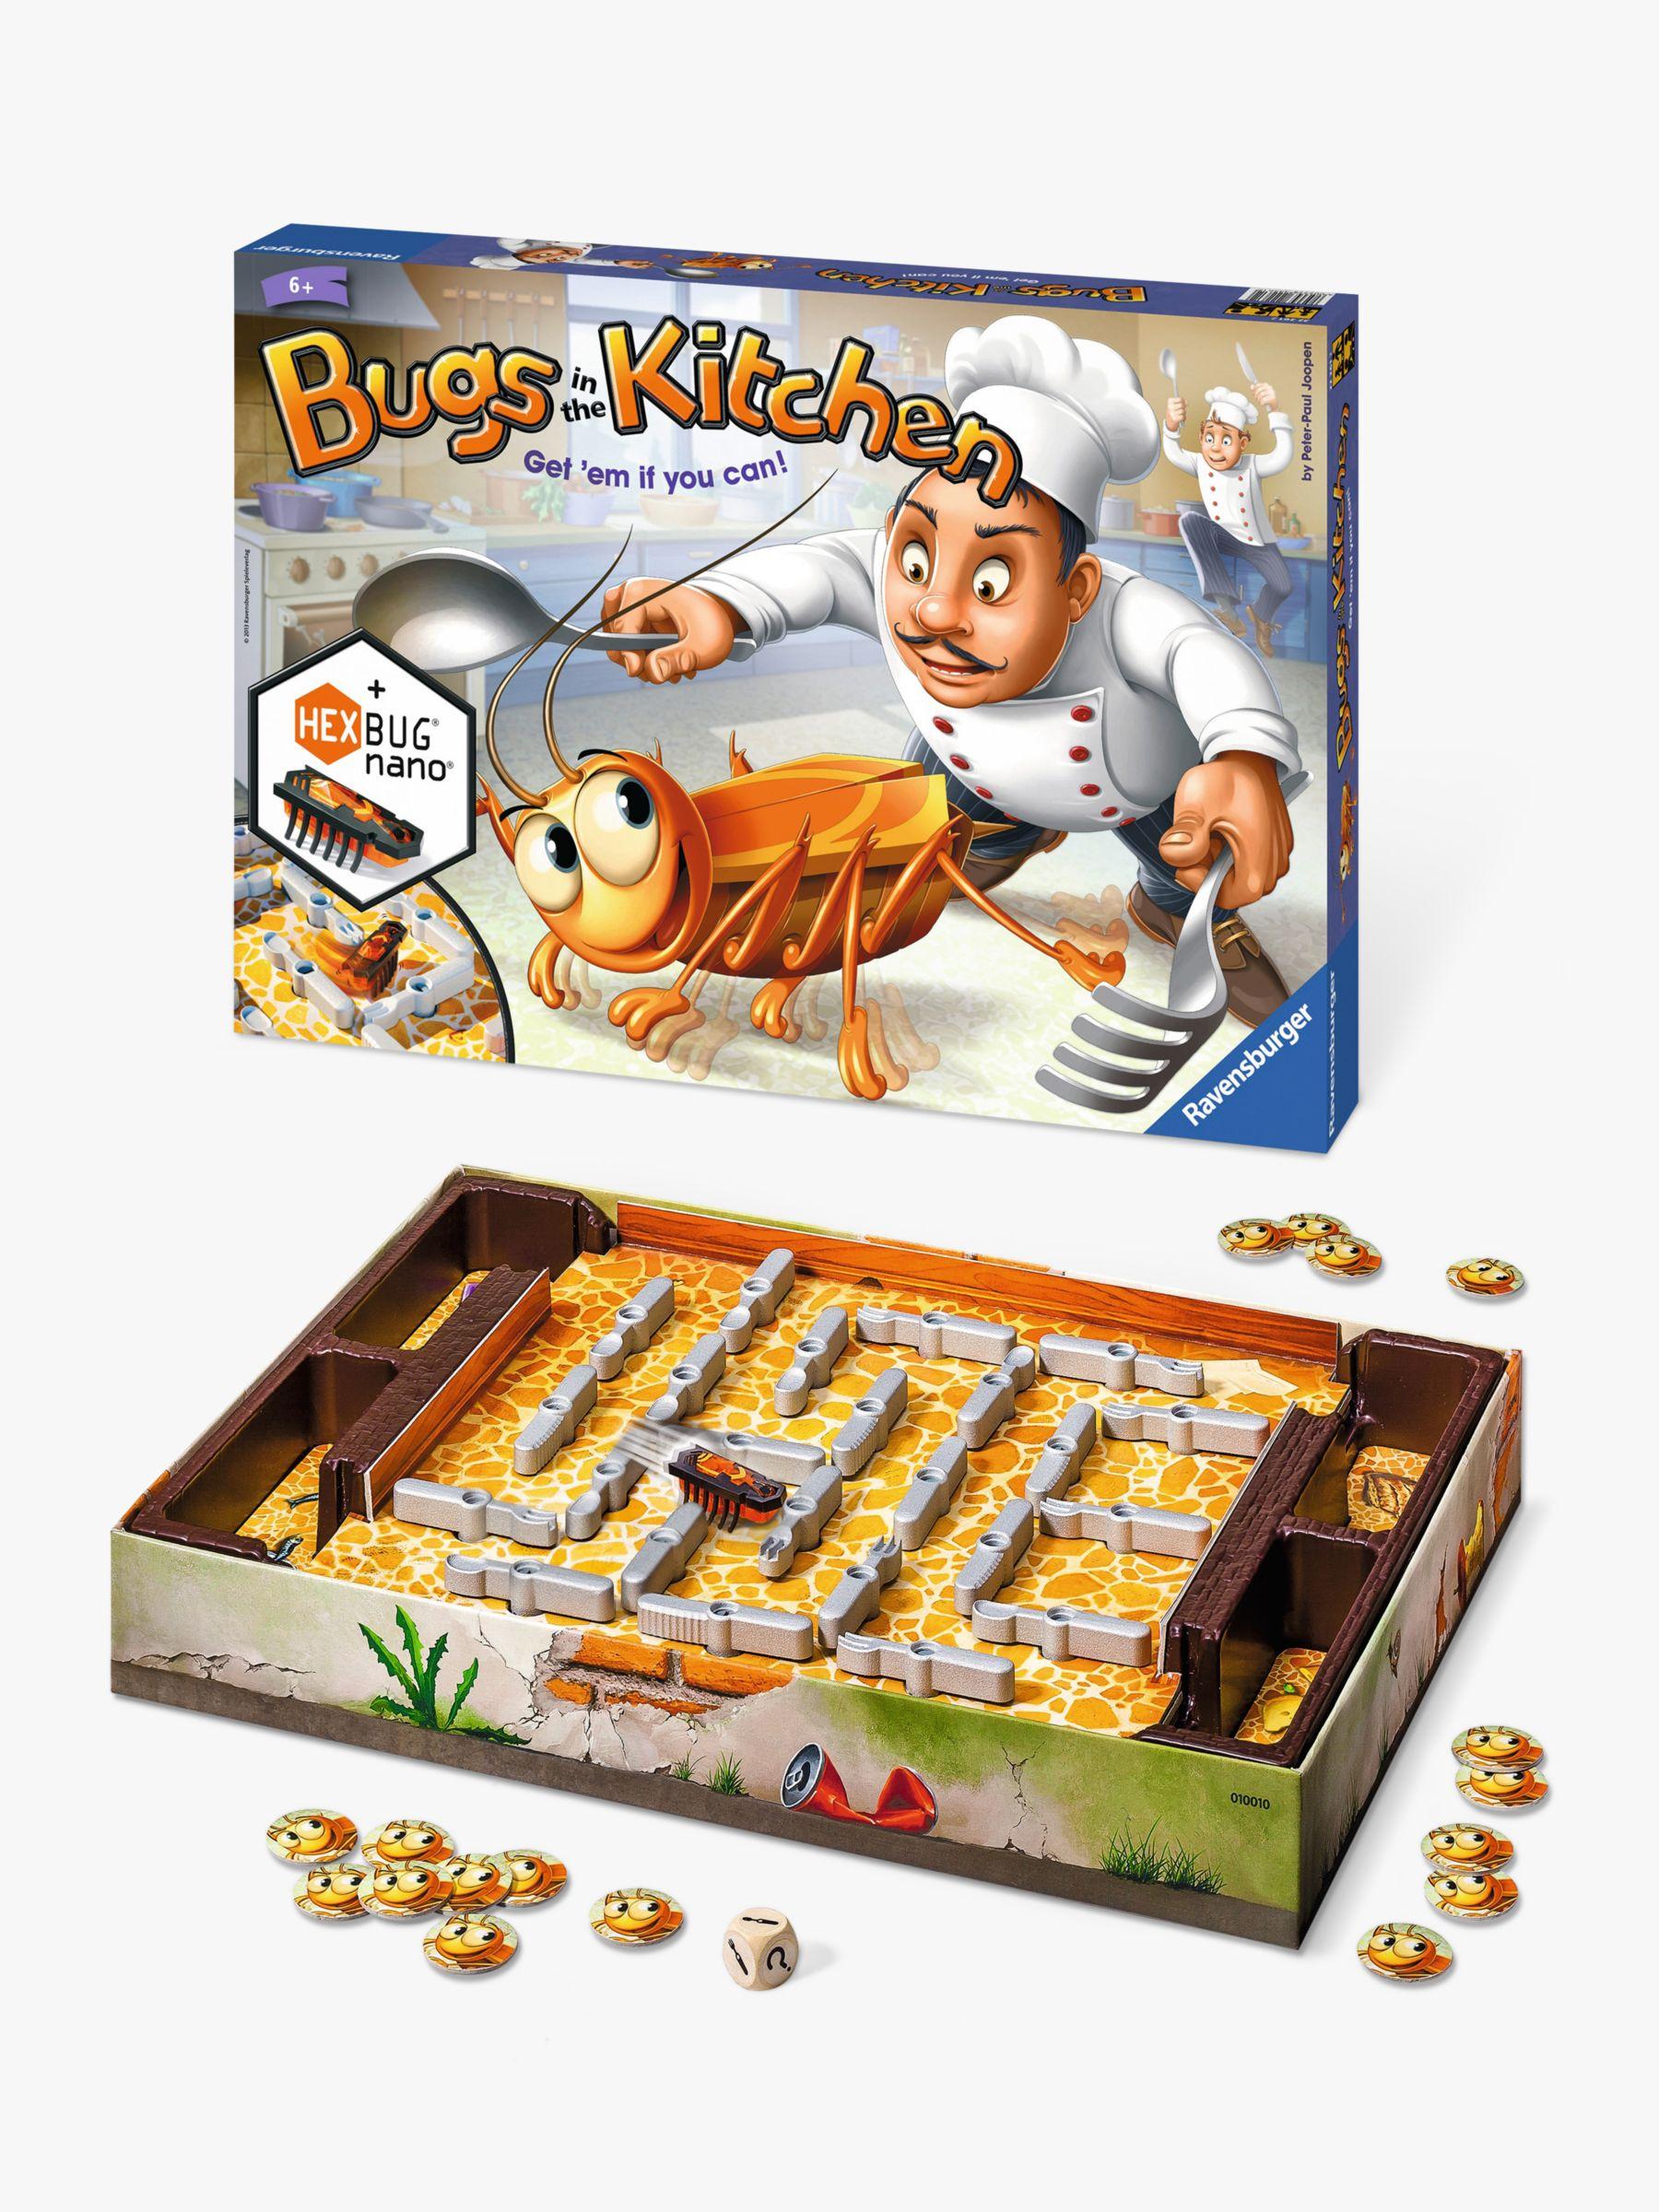 Ravensburger Ravensburger Bugs In The Kitchen Game with HEXBUG nano